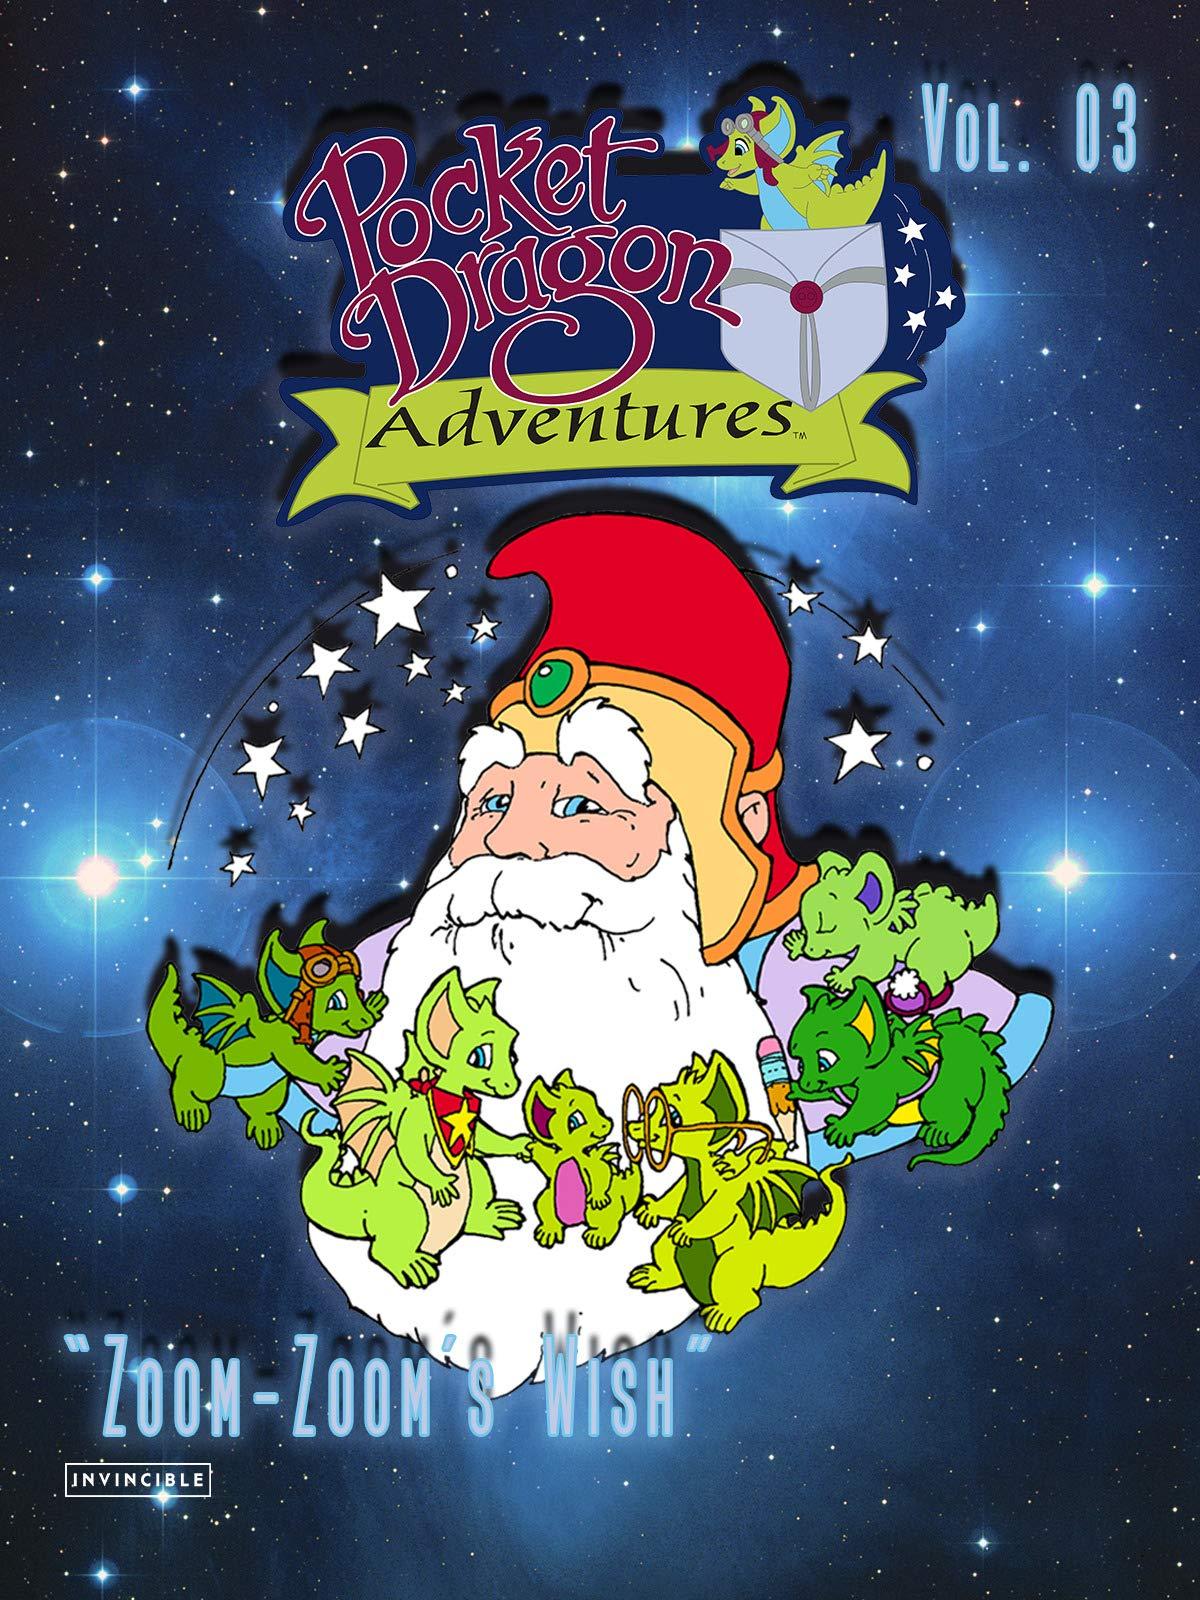 Pocket Dragon Adventures Vol. 03Zoom-Zoom's Wish